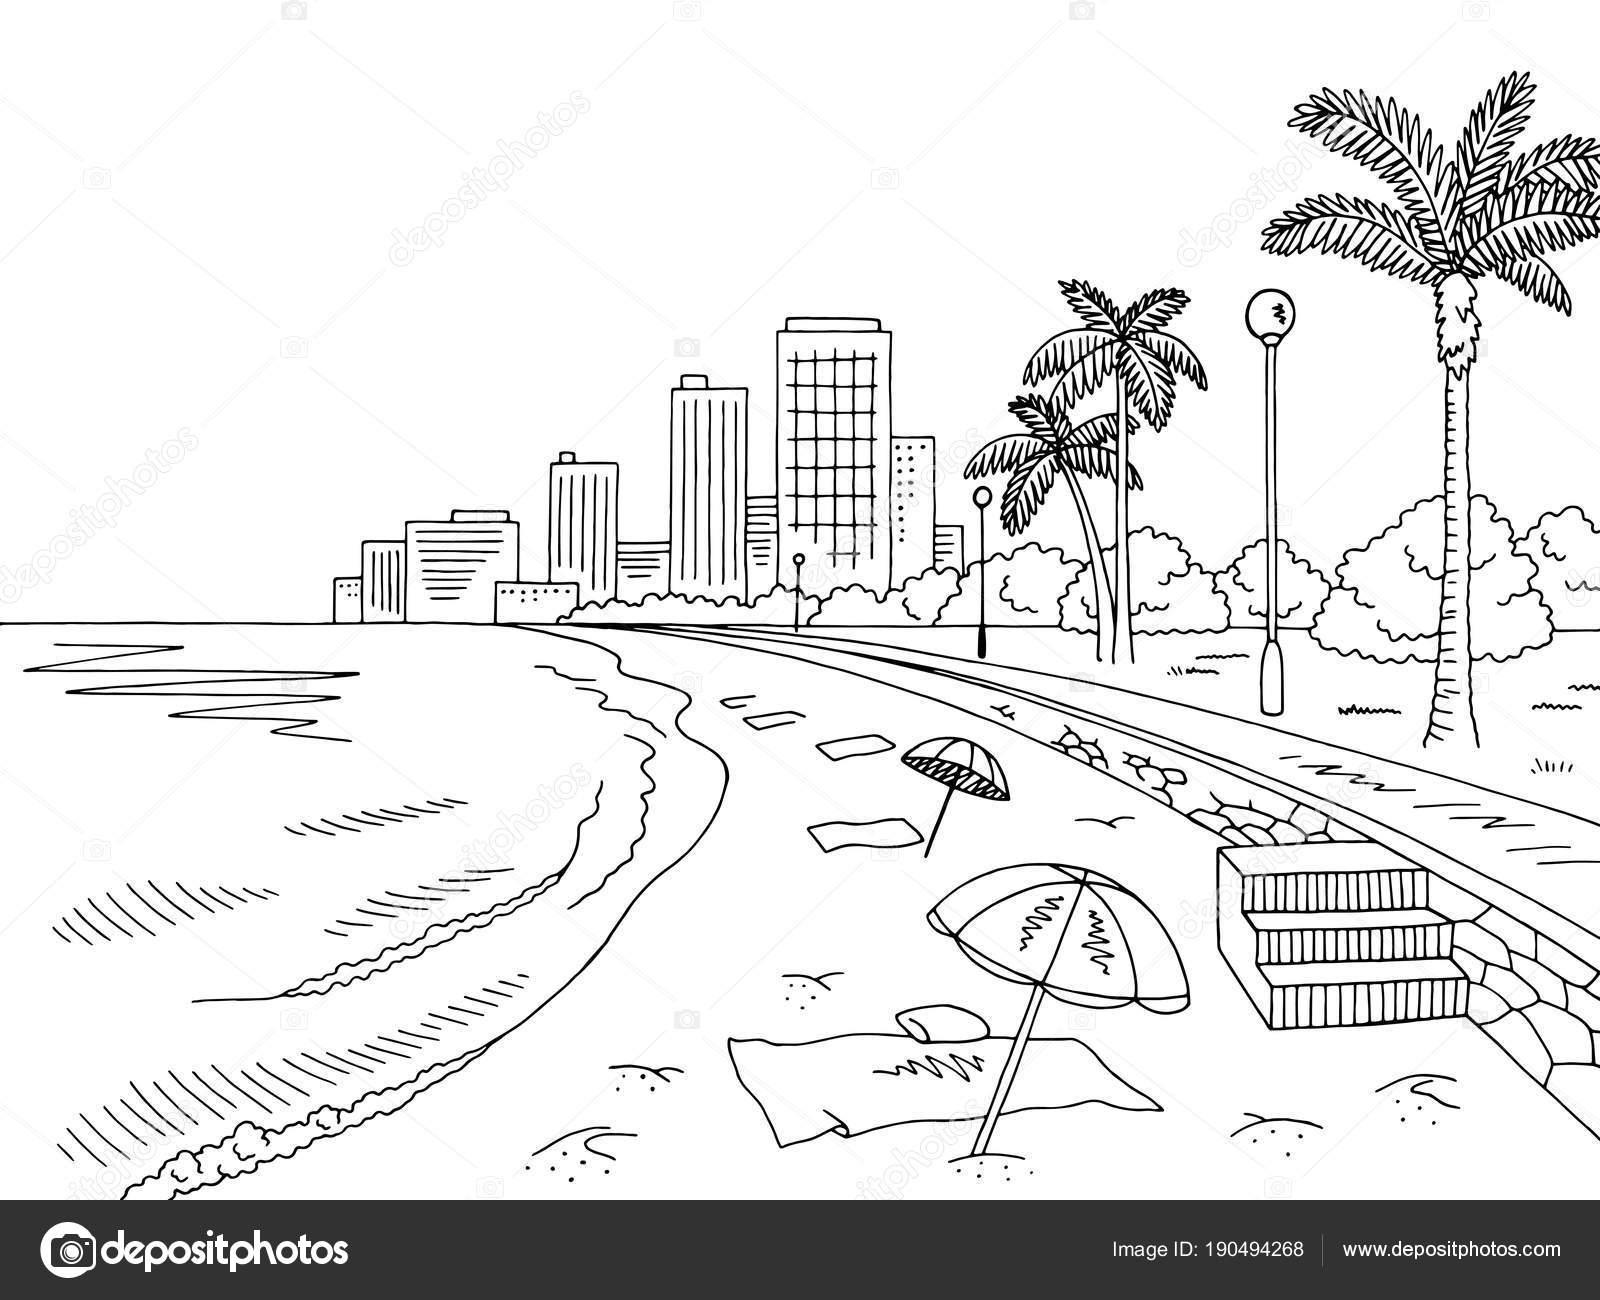 Imágenes Paisajes De Playa Para Pintar Paisaje Ciudad Blanca